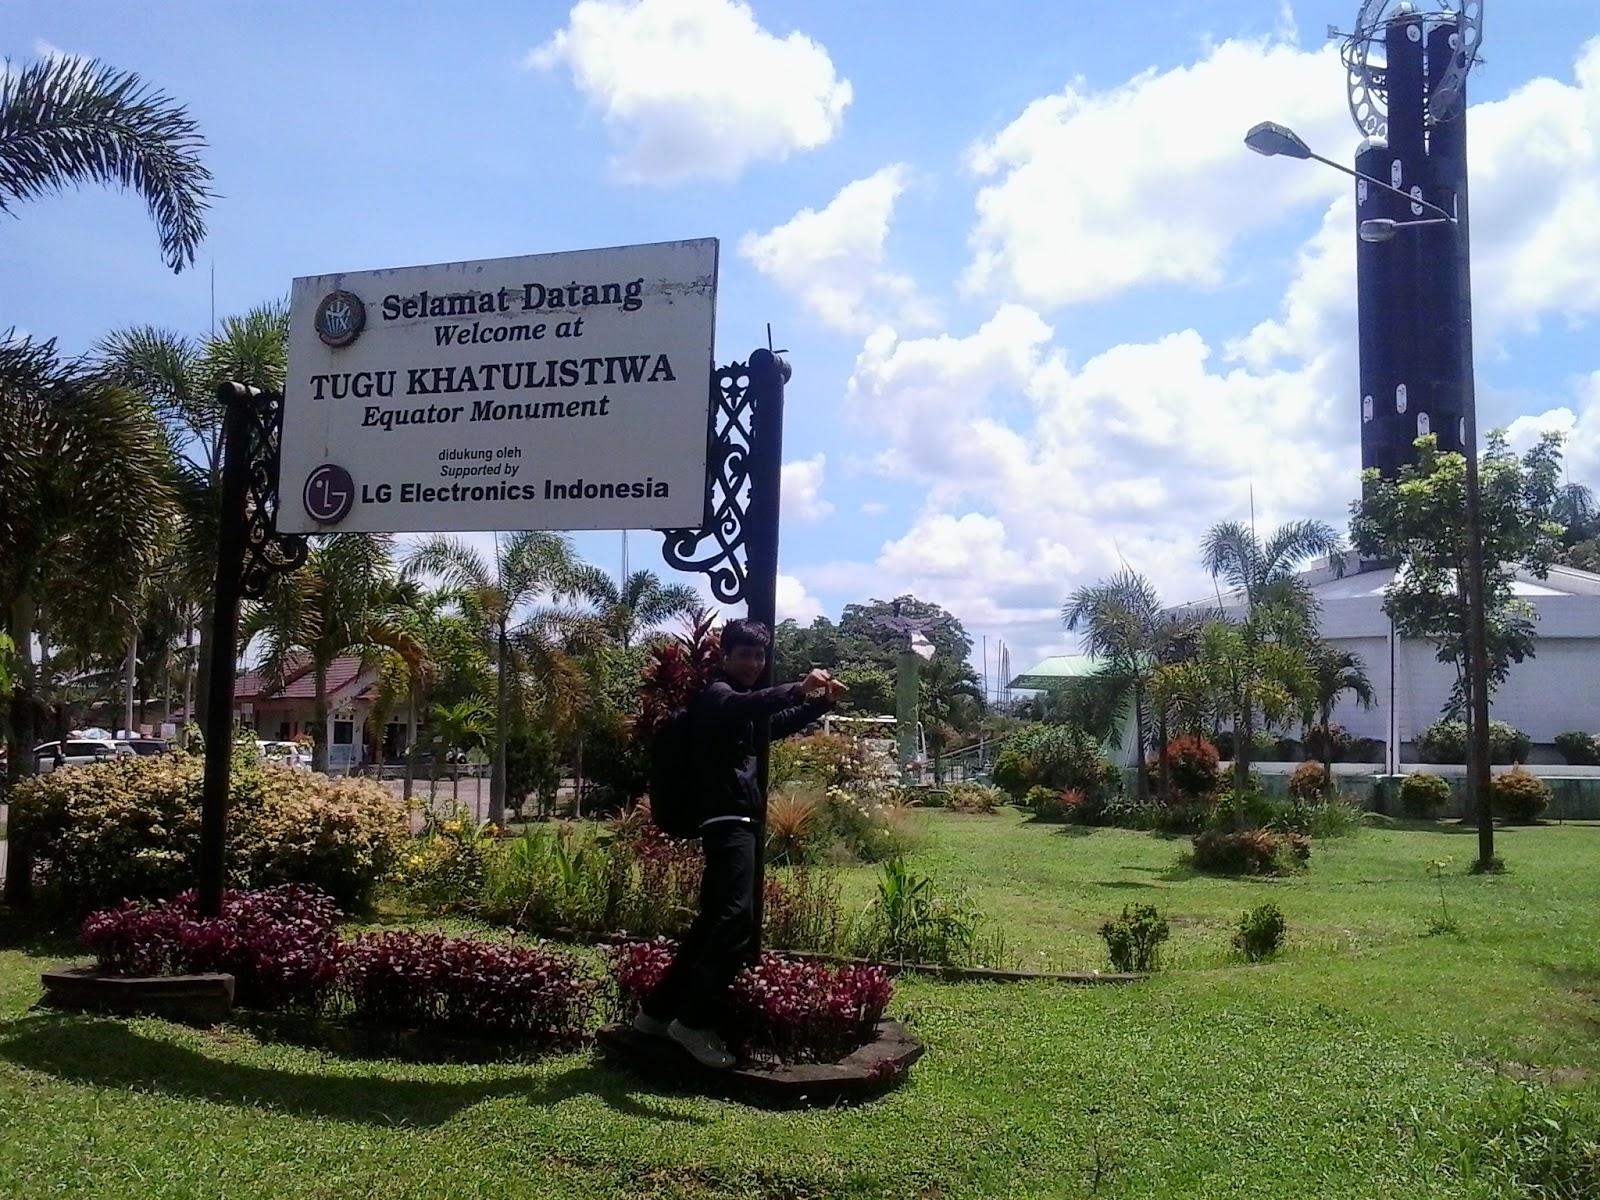 Tugu Khatulistiwa Berada Jalan Pontianak Utara Propinsi Kalimantan Barat Lokasinya